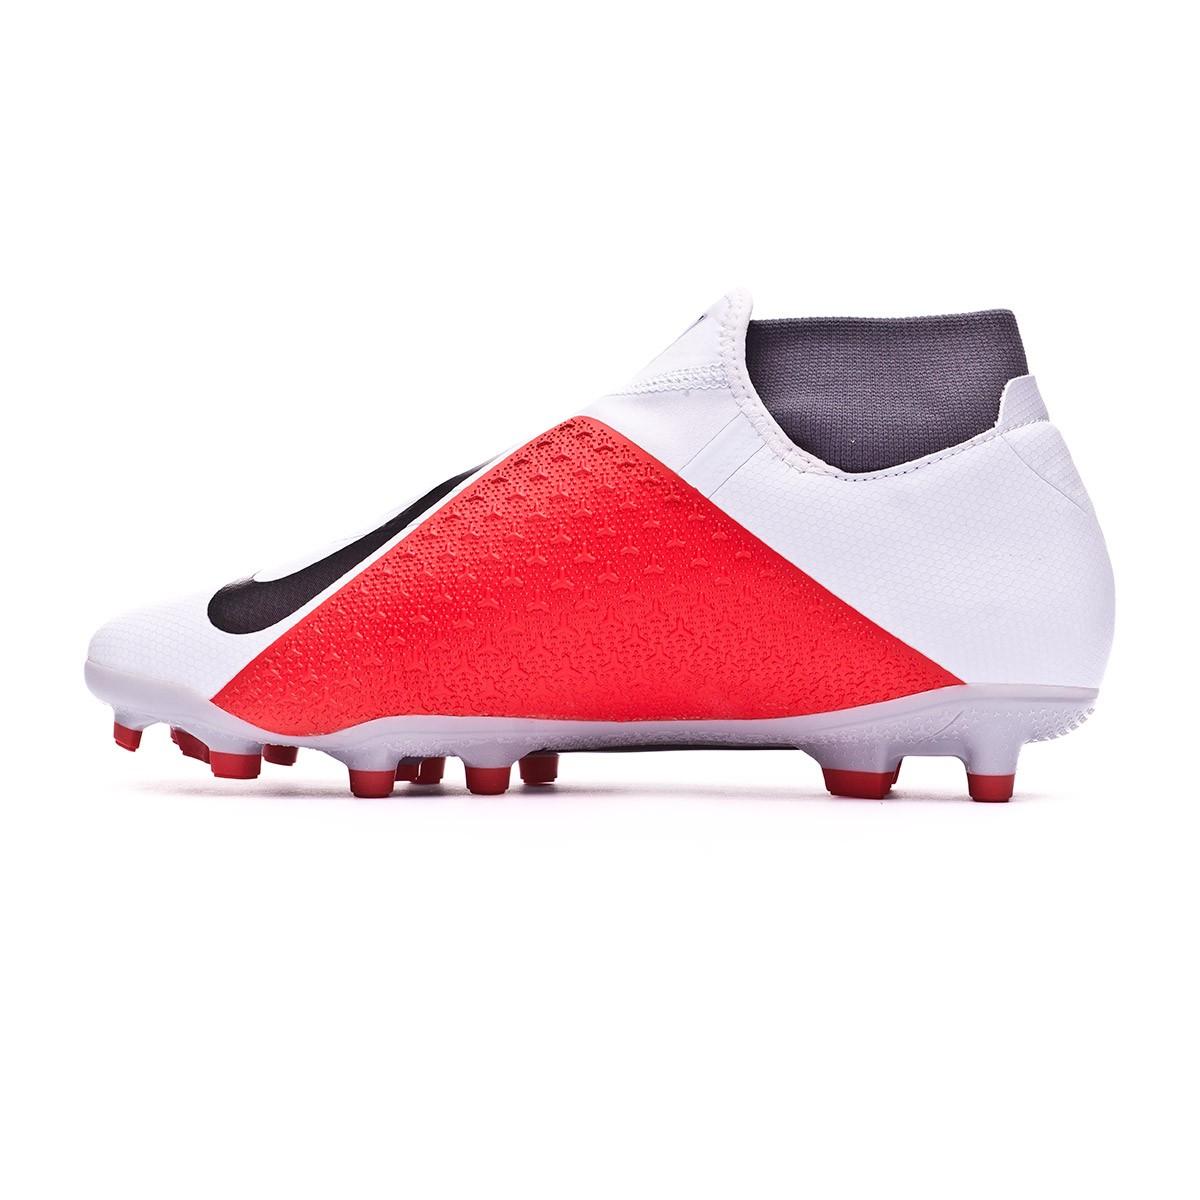 bf22328eccc Football Boots Nike Phantom Vision Academy DF MG Pure platinum-Black-Light  crimson-Dark grey - Football store Fútbol Emotion